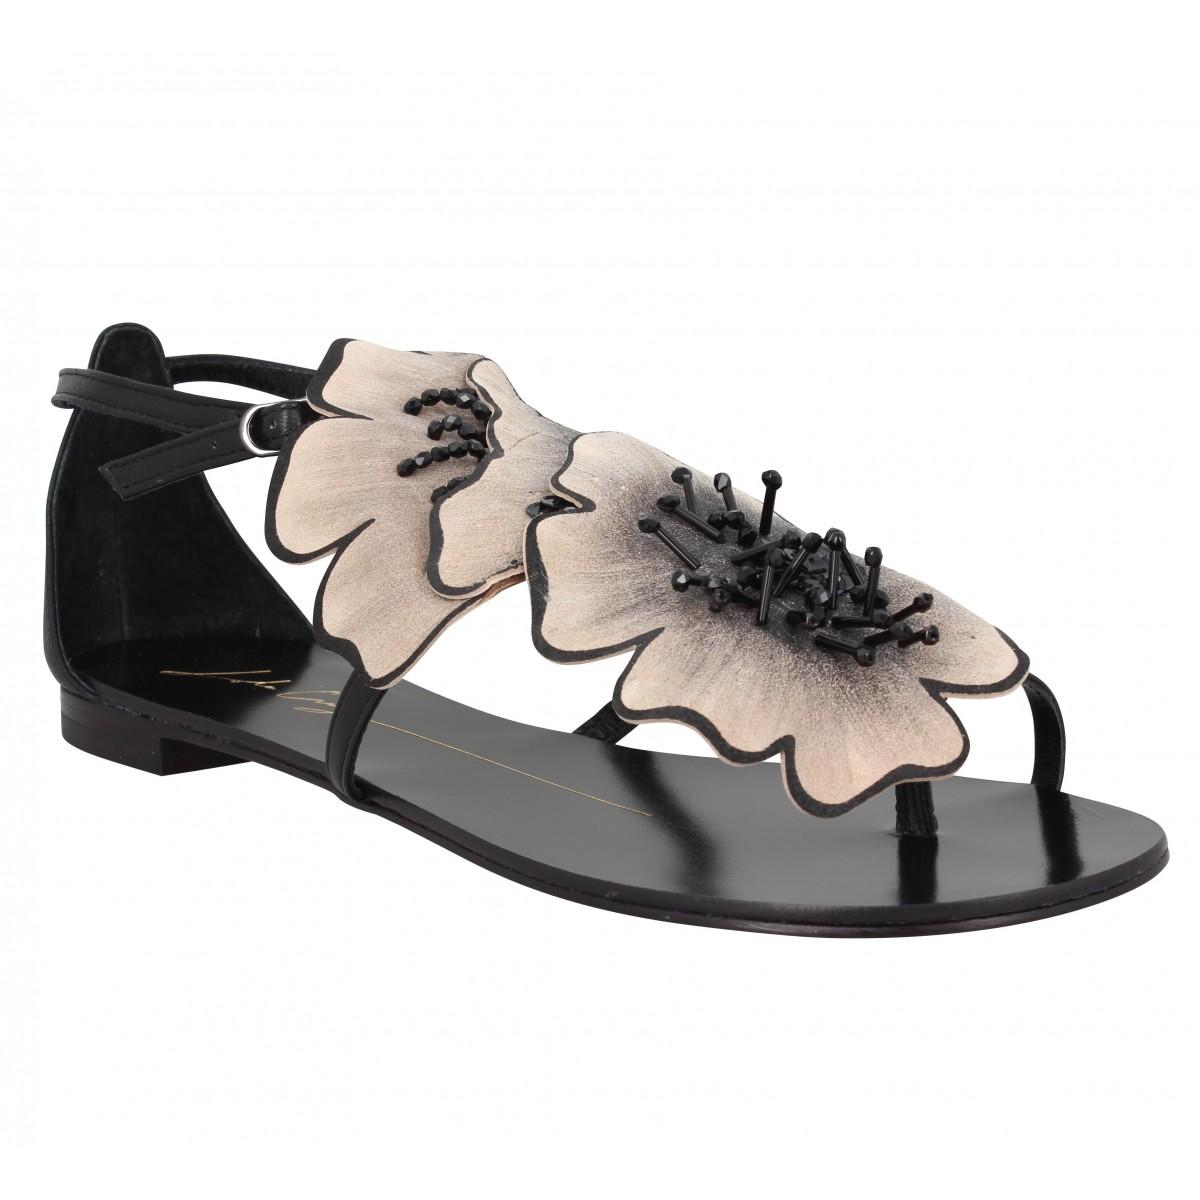 Nu-pieds LOLA CRUZ 34Z Fleur cuir Femme Black